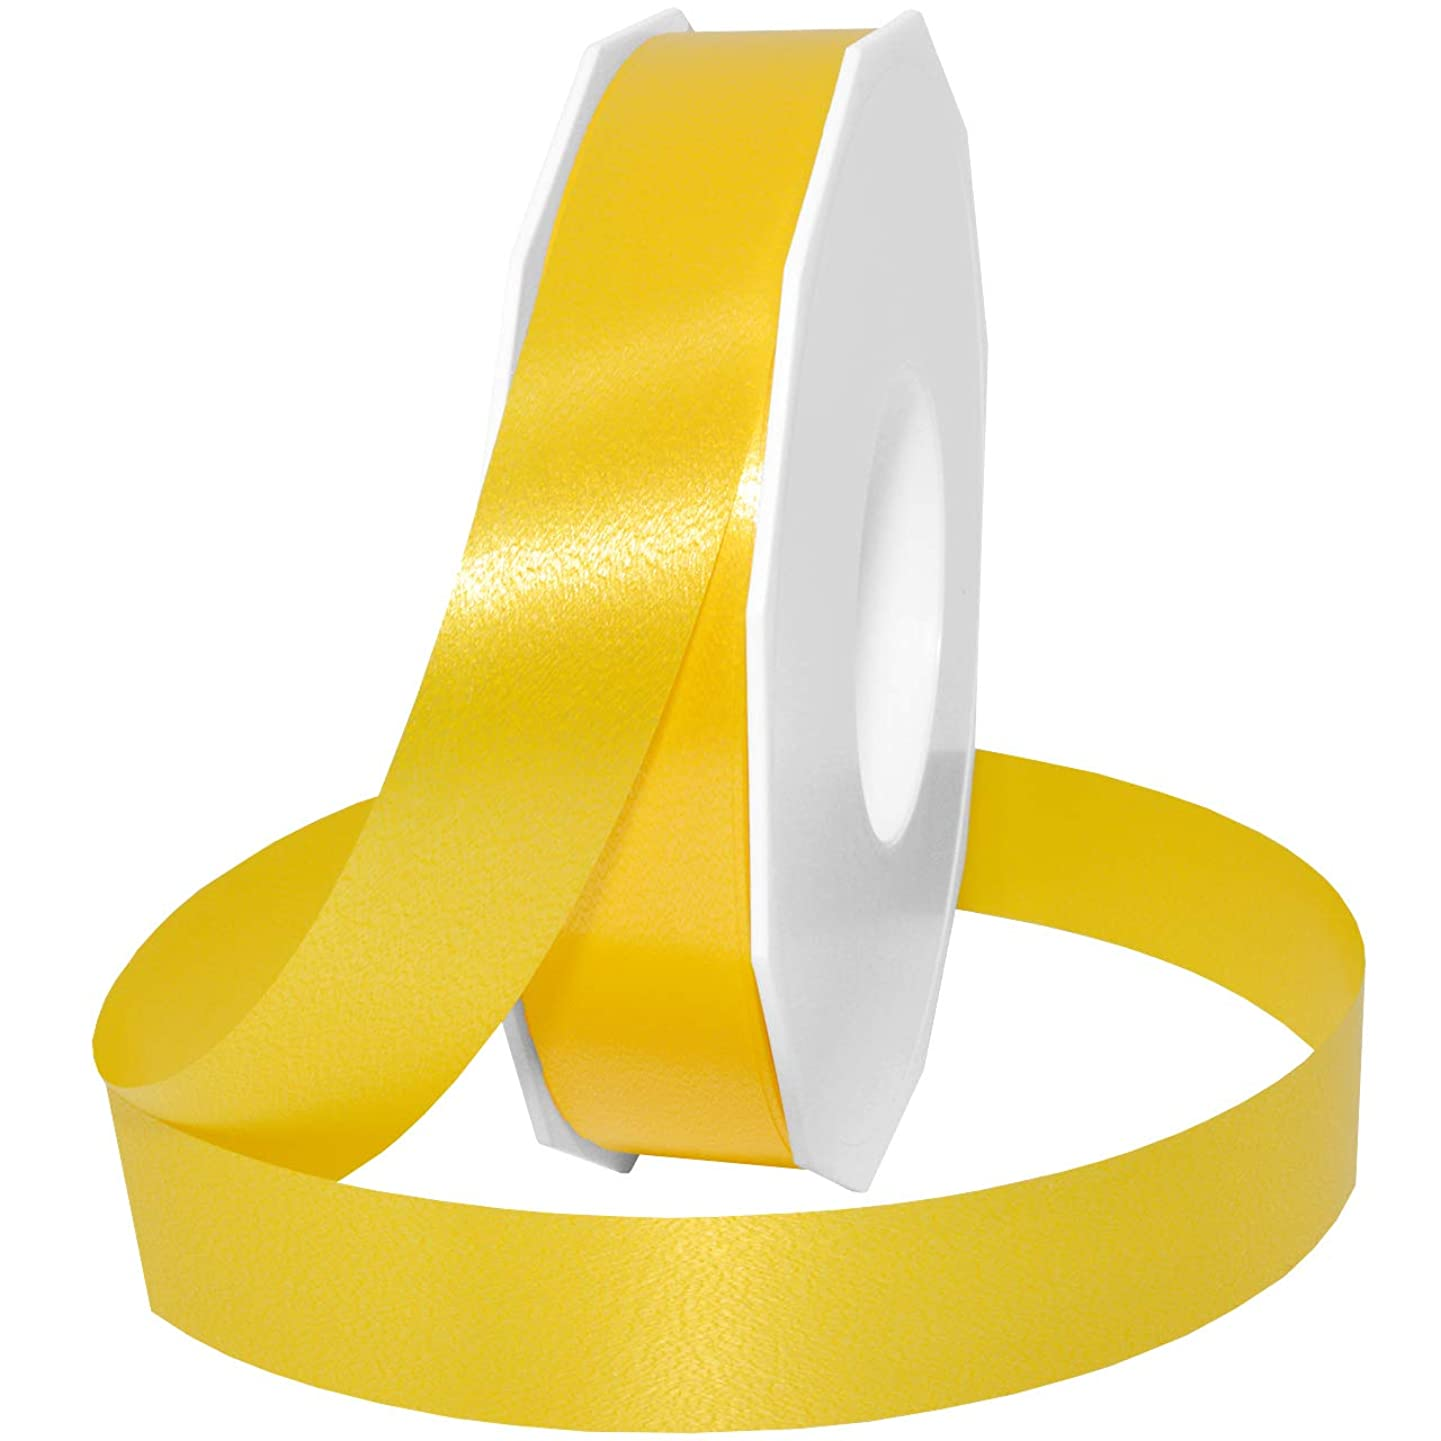 Morex Ribbon Style 187 Ribbon, 1 inch by 100 Yards, Yellow